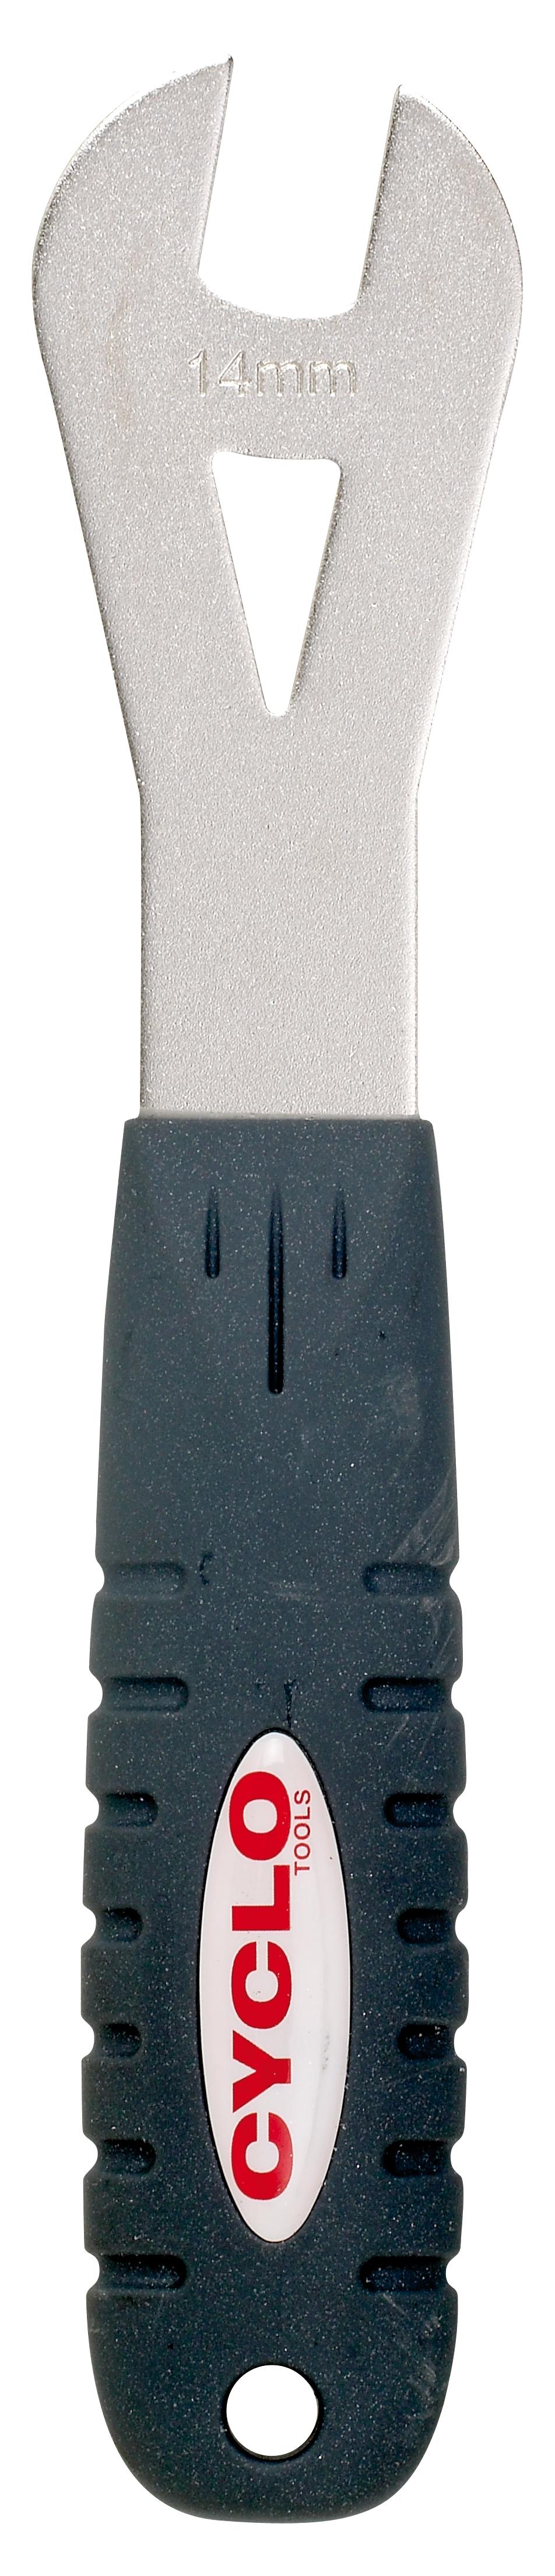 Захват д/конусов втулок 7-06374 14мм высокопрочн. сталь рукоят. в эргон. кожухе (10) CYCLO (Англия)